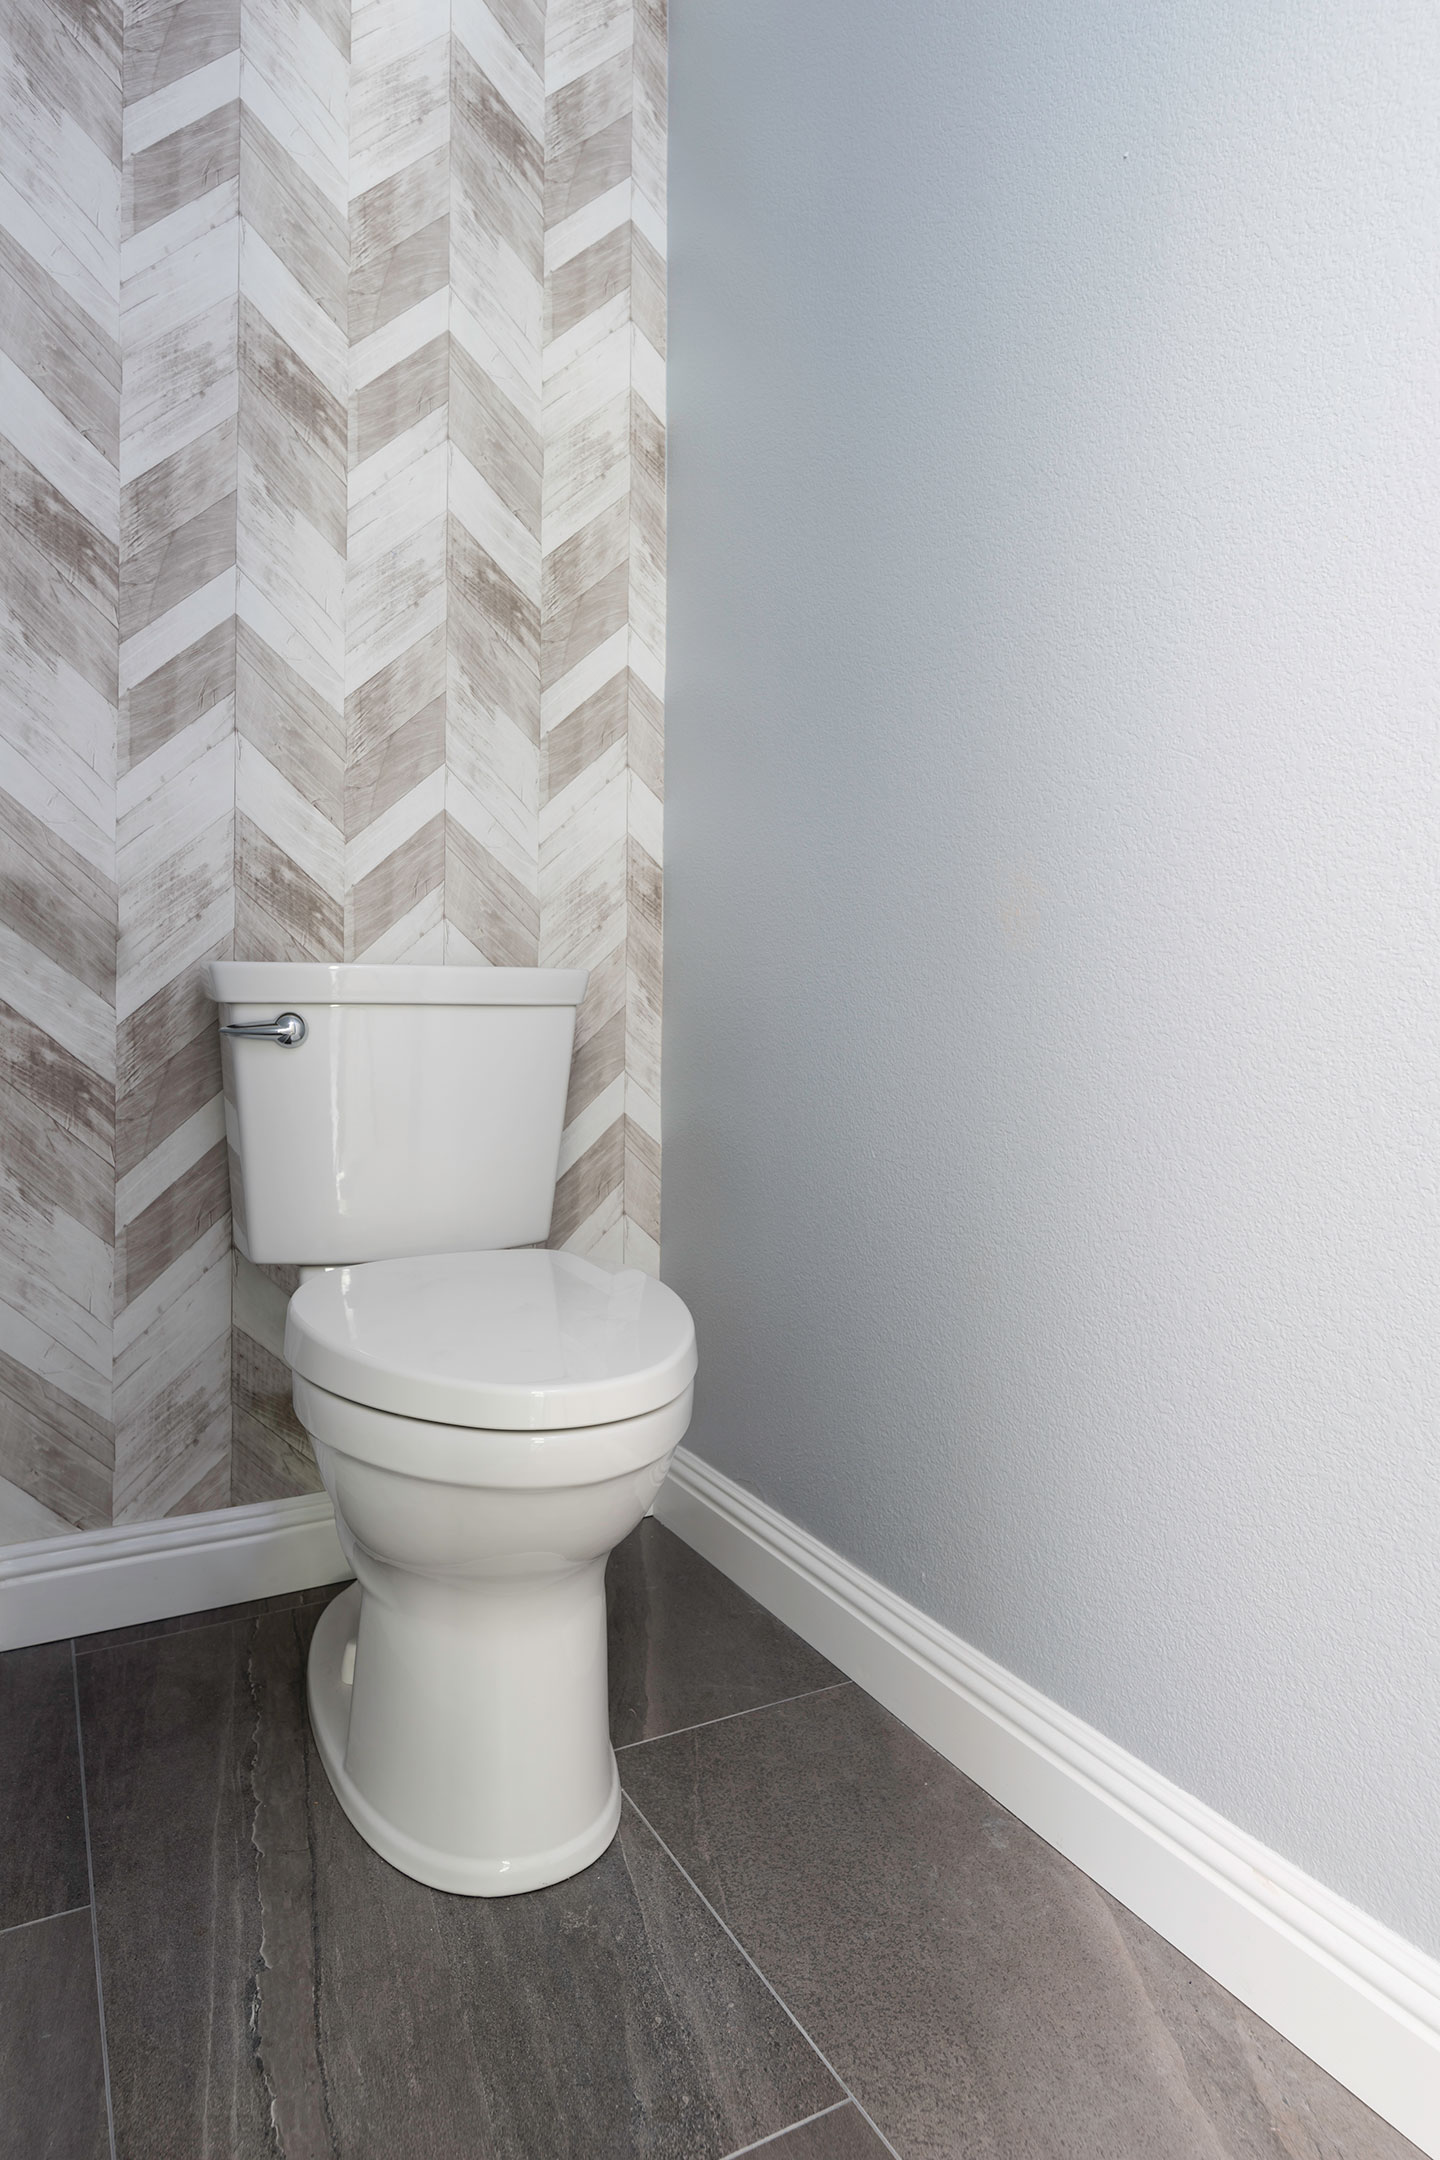 toilet area with a herringbone back wall